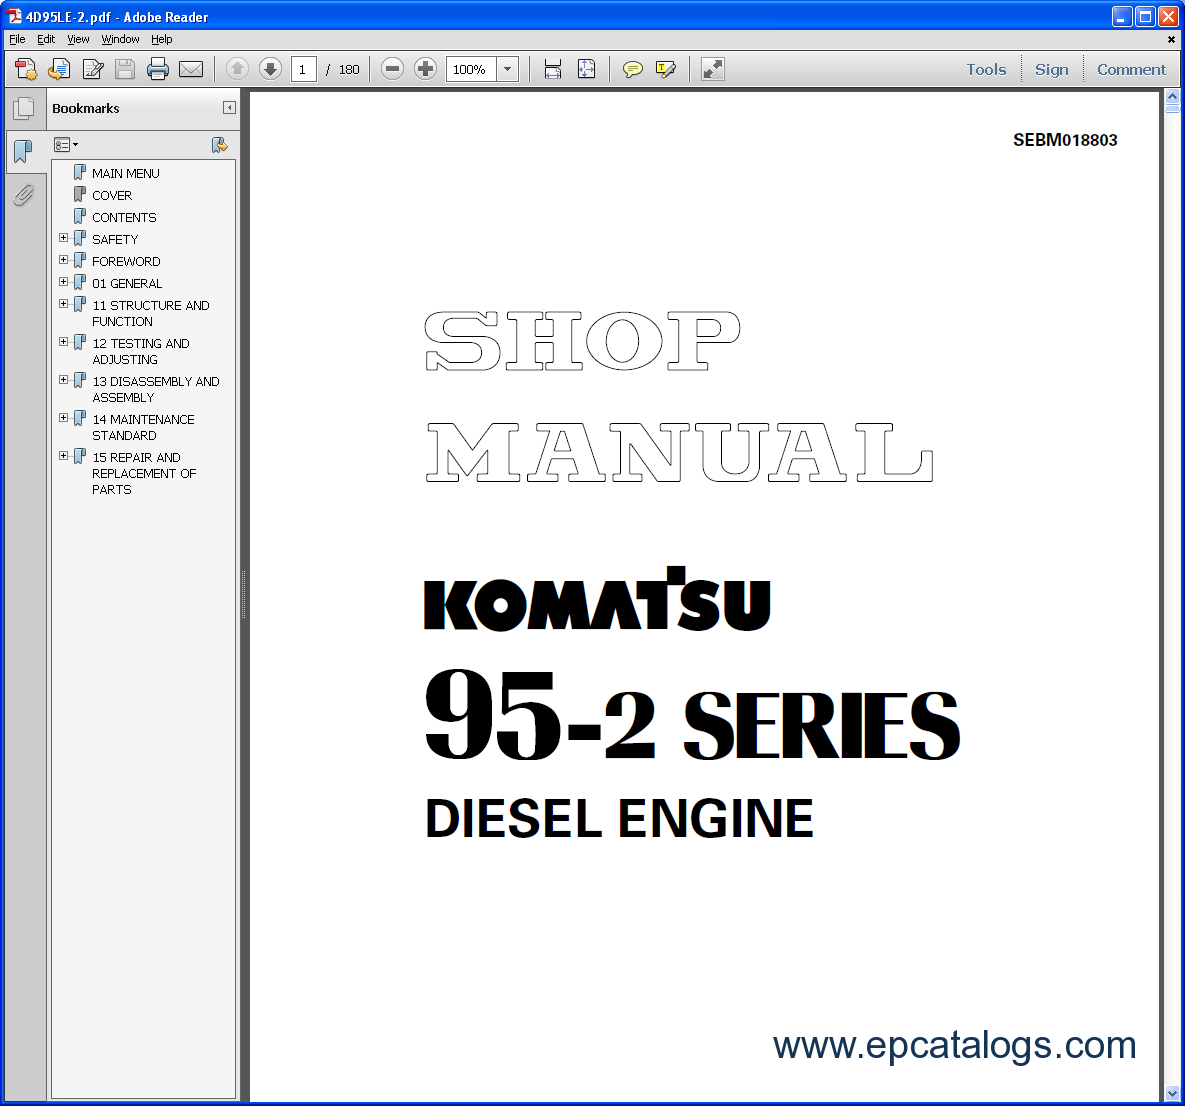 repair manual Komatsu CSS Service Engines - 3